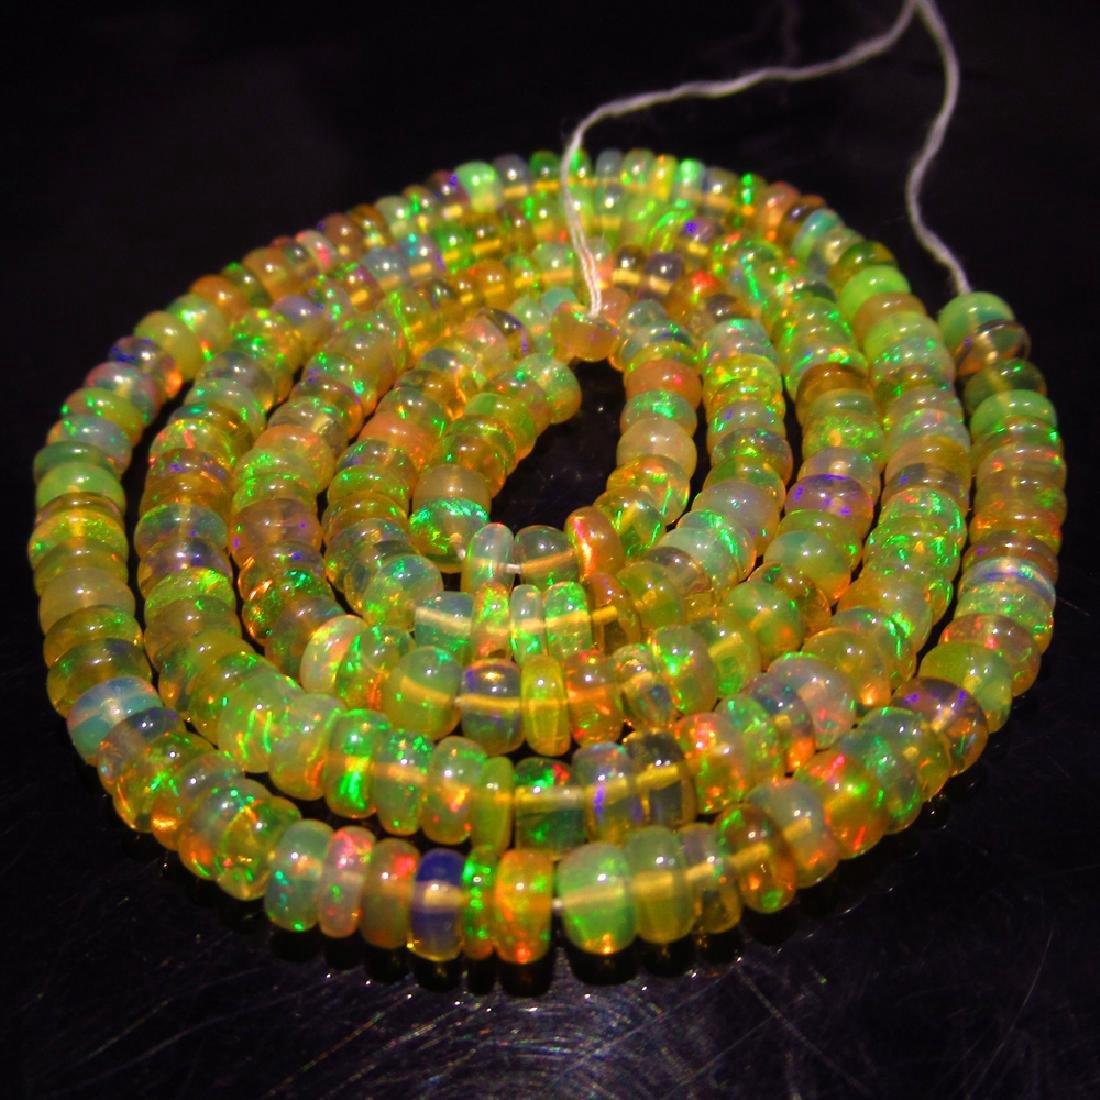 39.07 Ctw Natural Loose Honey Opal Beads Necklace Set